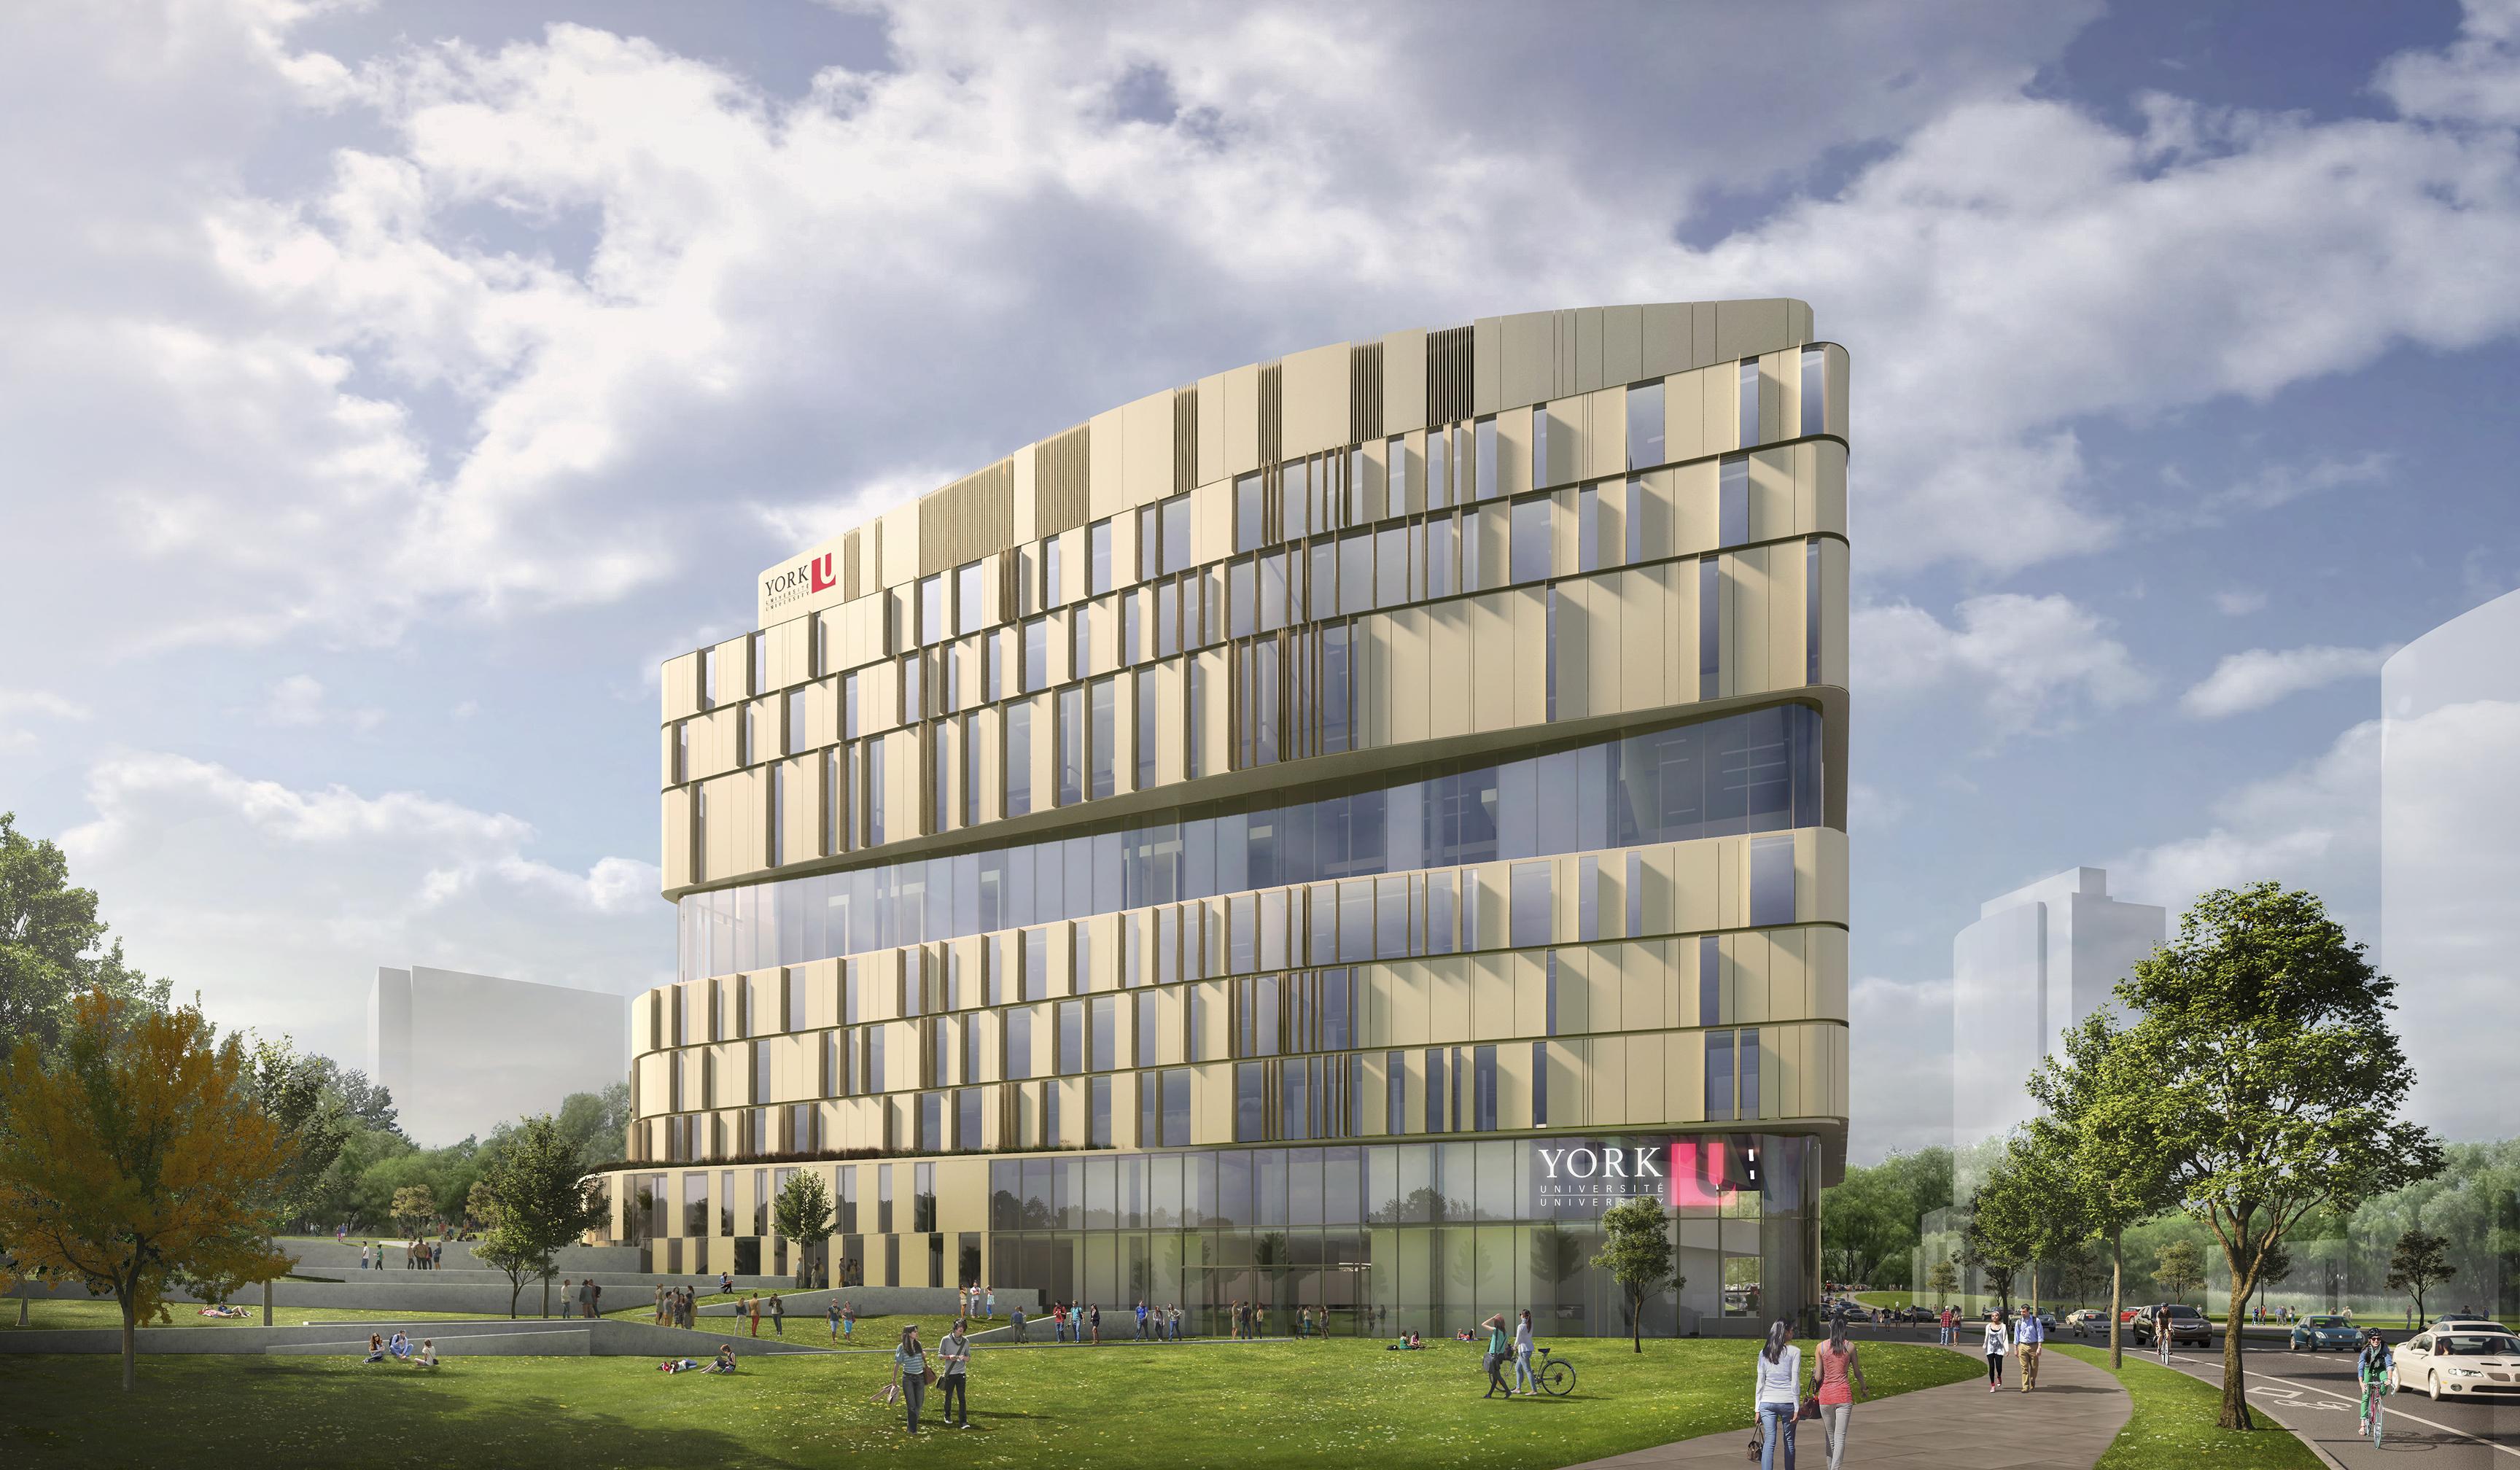 architect rendering of York University's Markham Centre campus